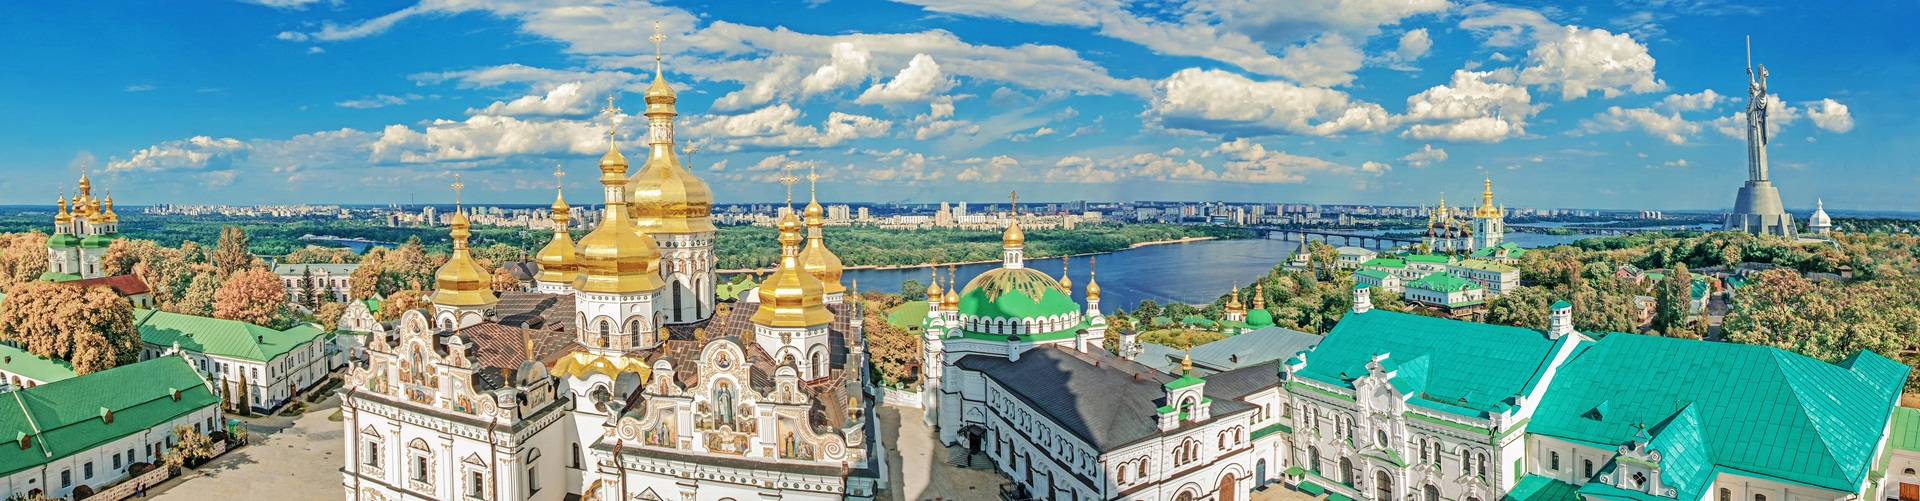 kyiv-pechersk-lavra-ukraine